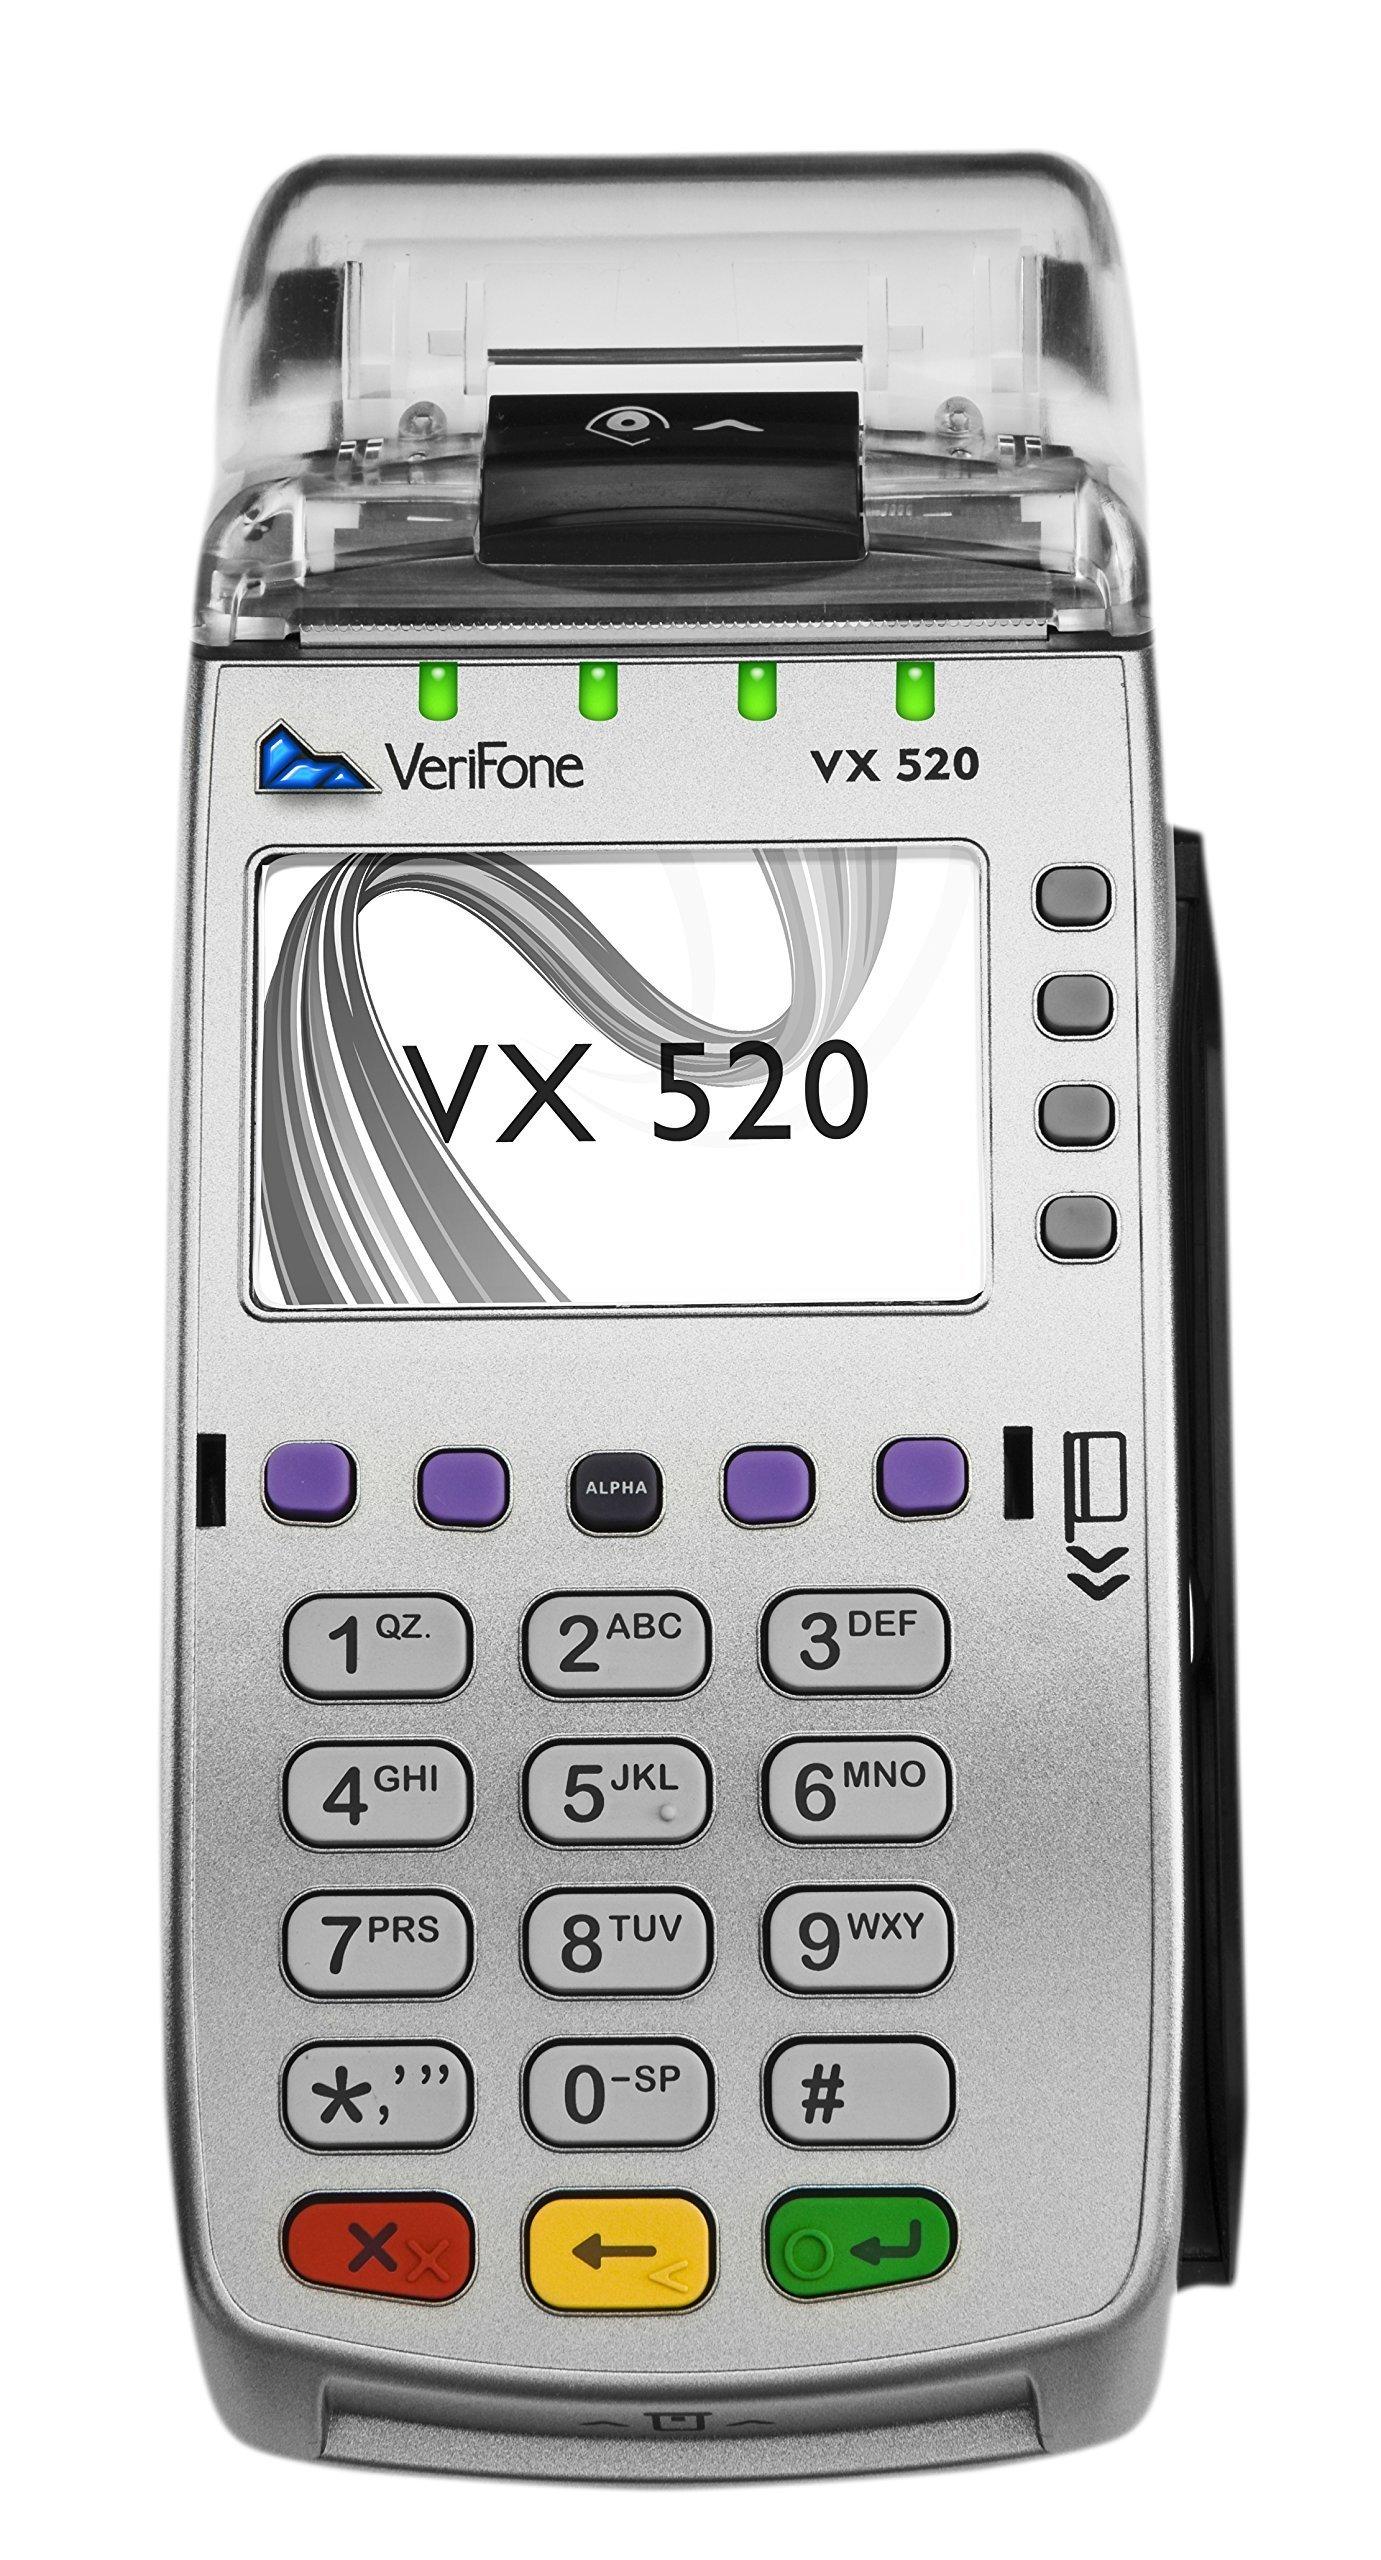 VeriFone Vx520 EMV CLTS 32MB Credit Card Terminal by VeriFone